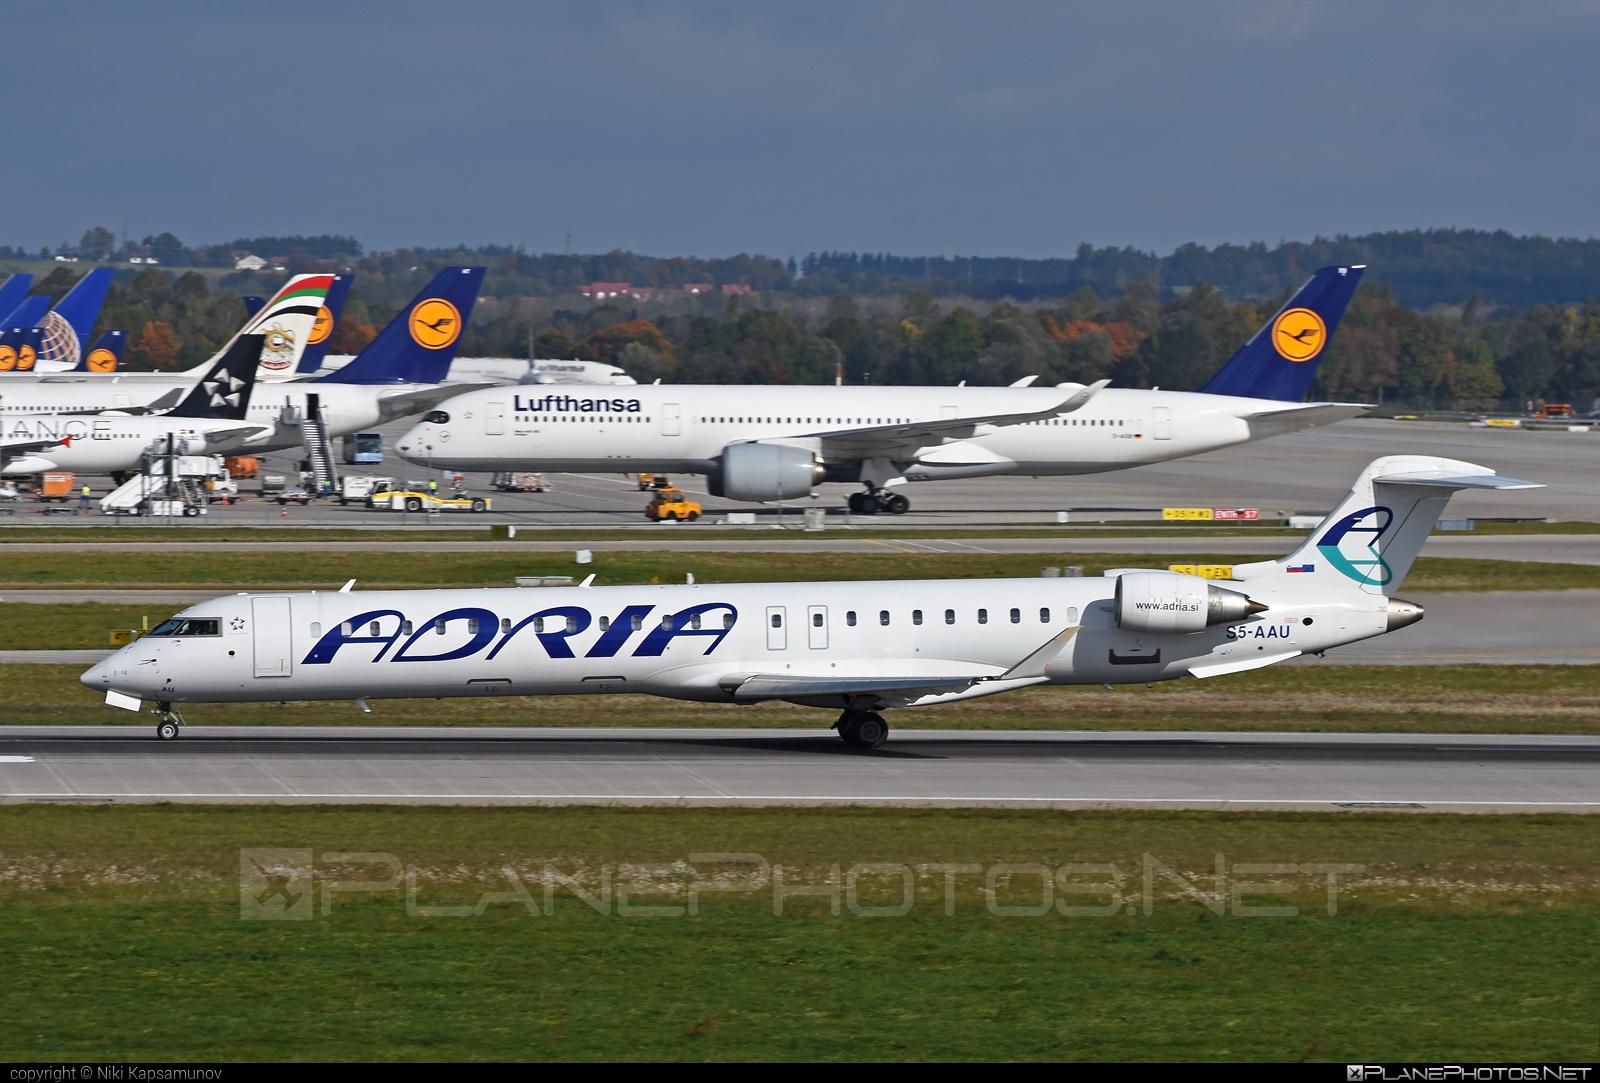 Bombardier CRJ900LR - S5-AAU operated by Adria Airways #bombardier #crj900 #crj900lr